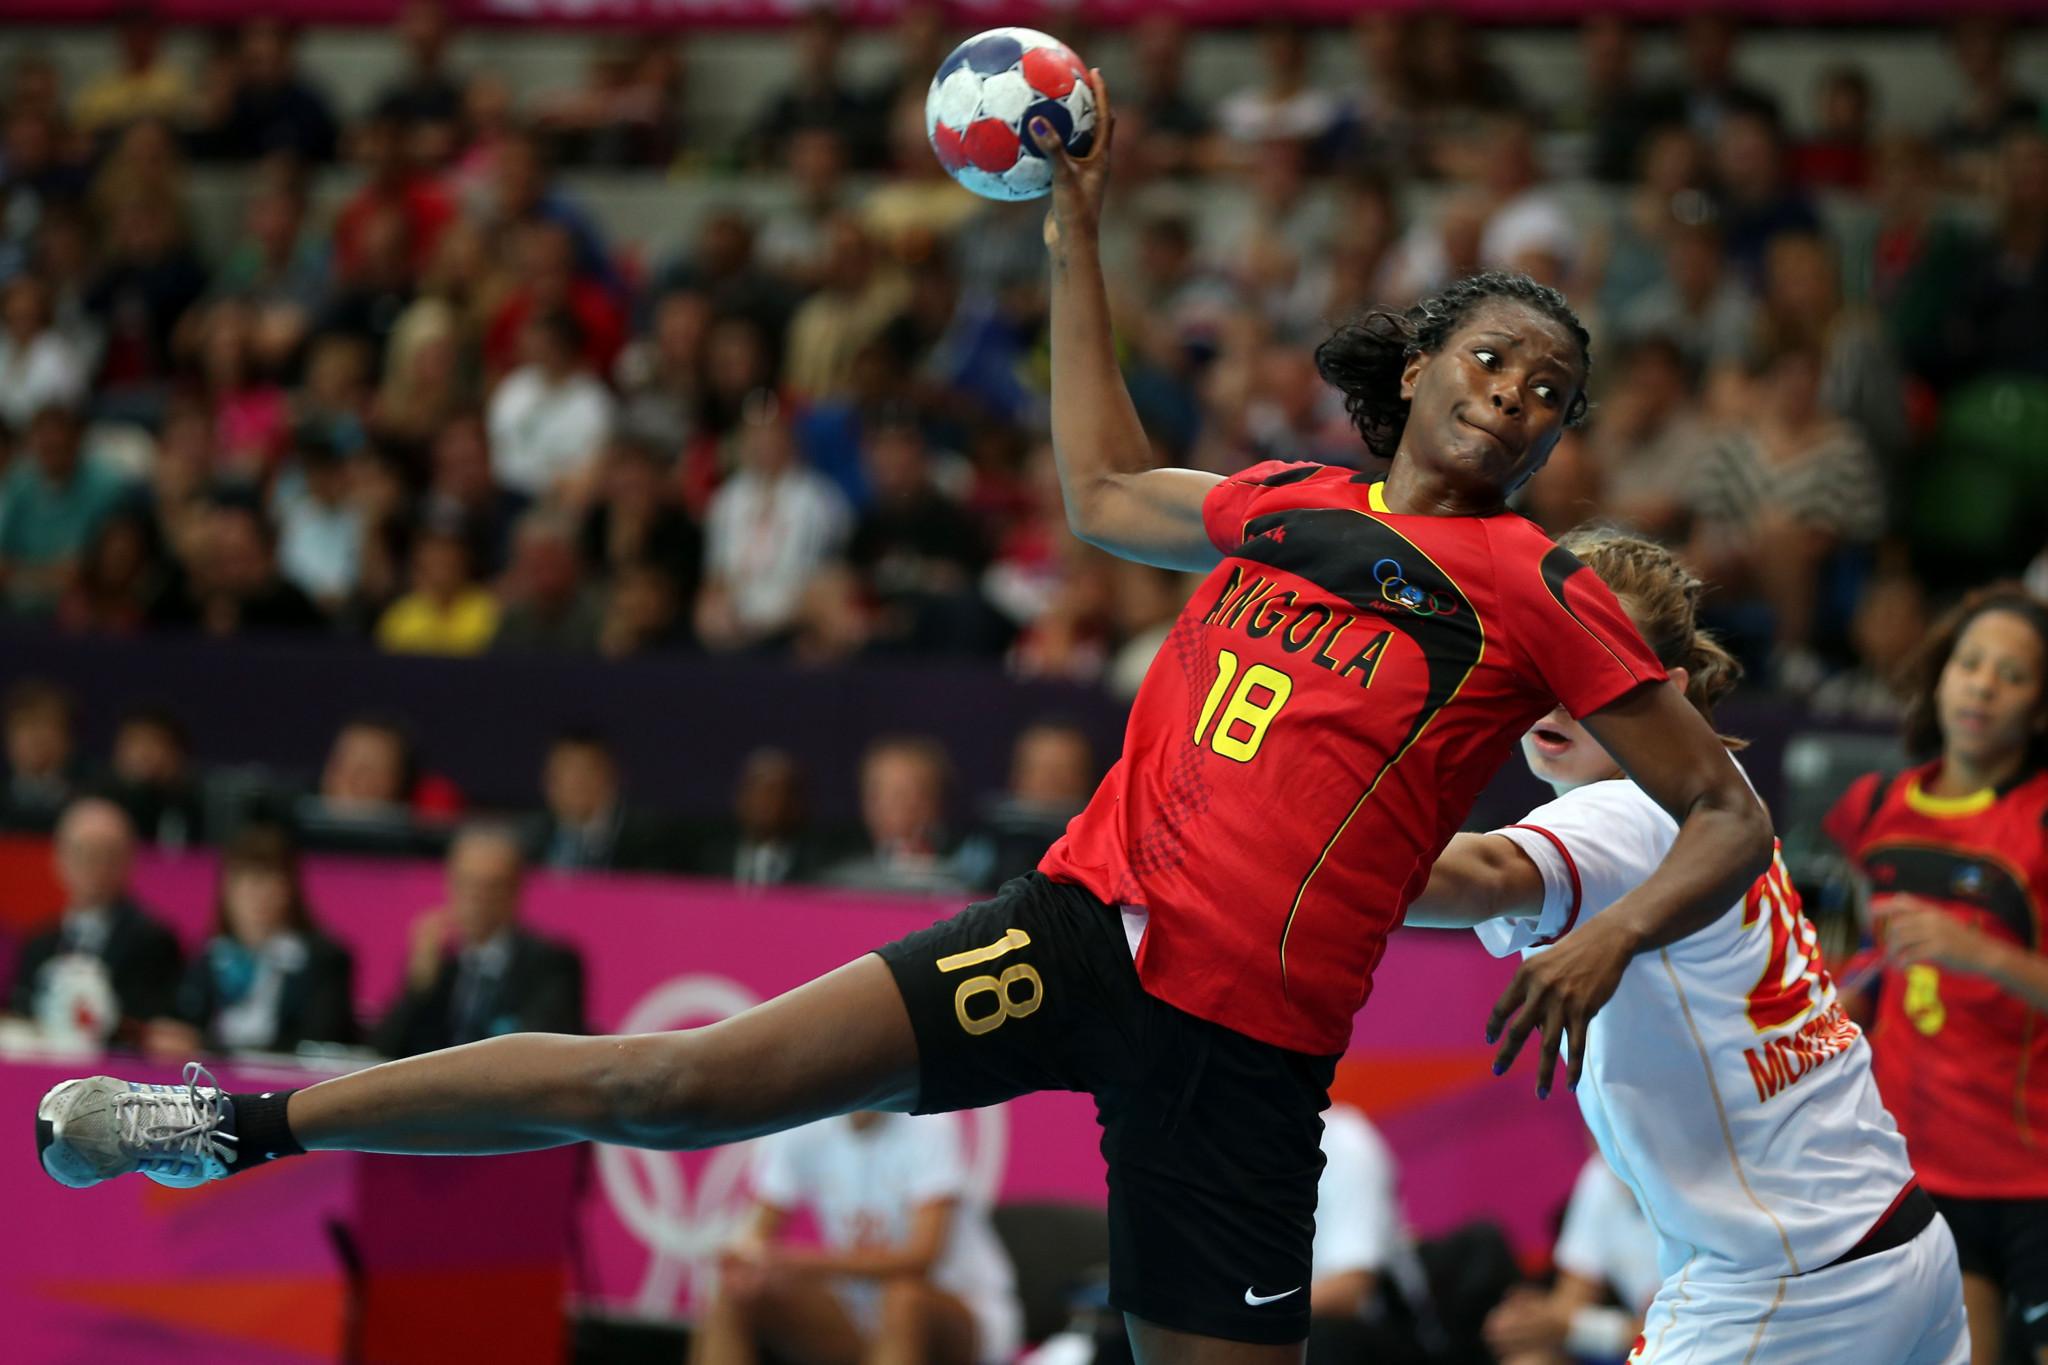 Angola make impressive start in quest for third straight African women's handball title